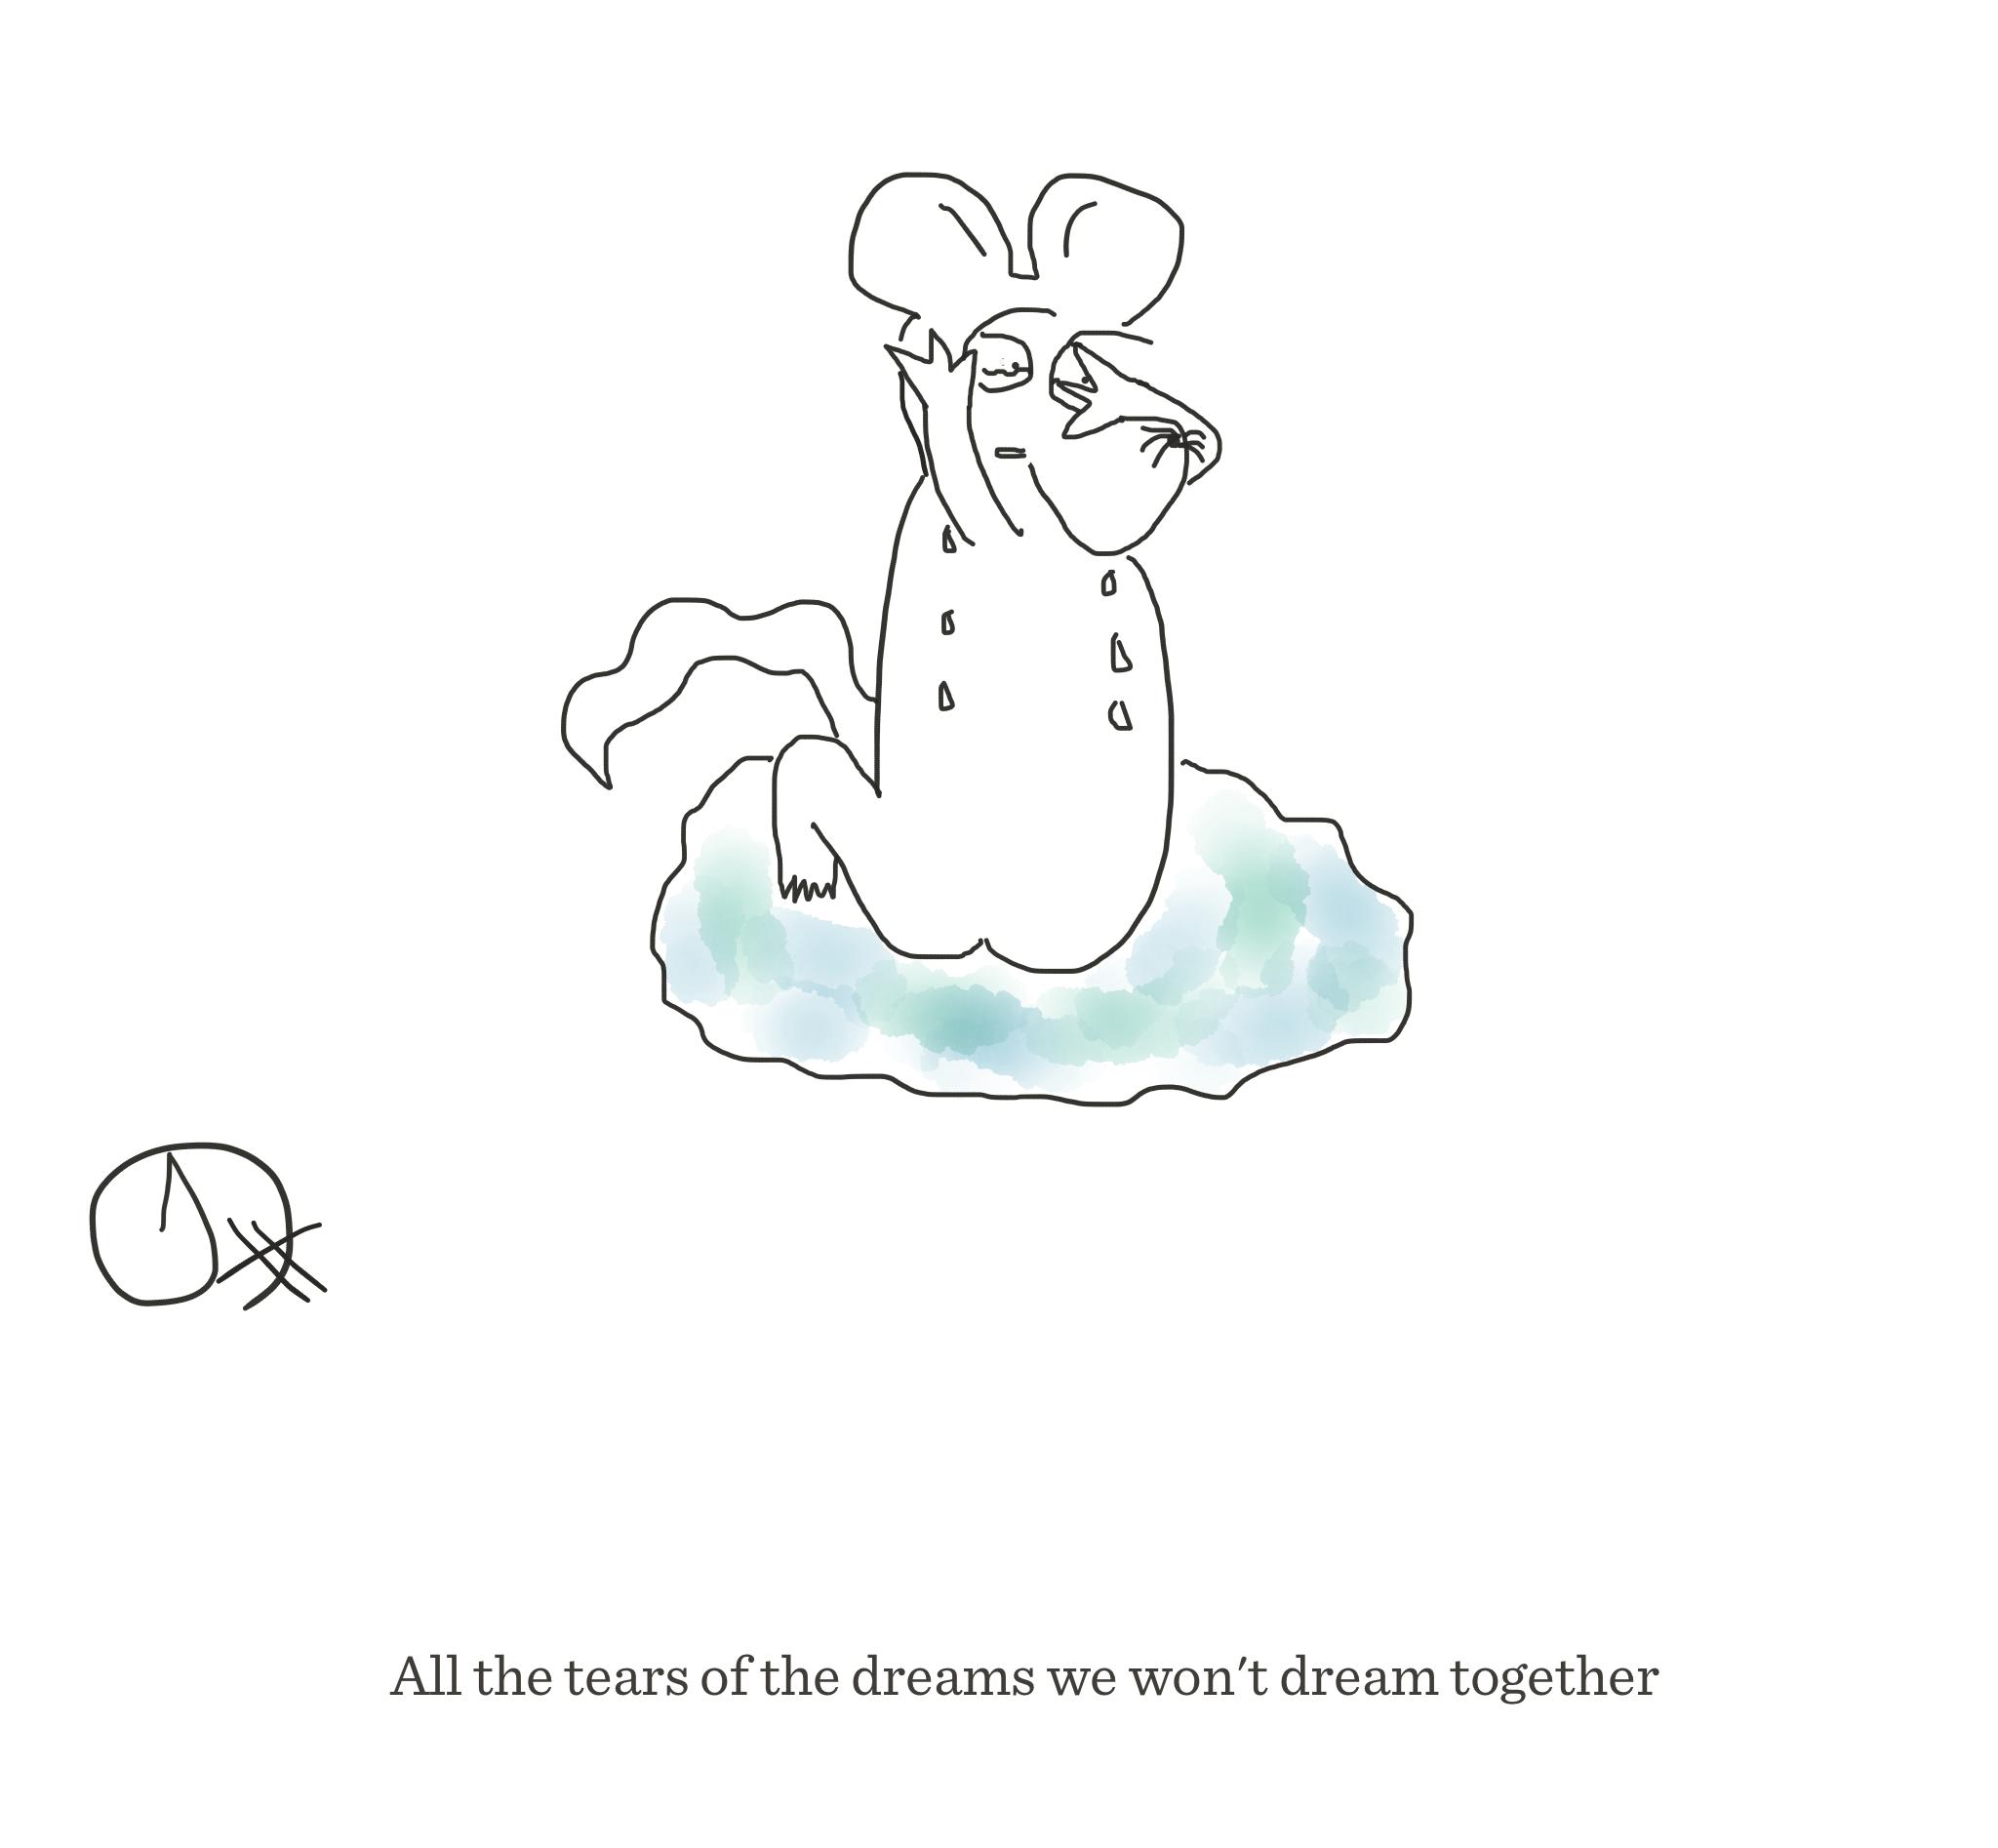 Dreams we won't dream together, The Happy Rat cartoon